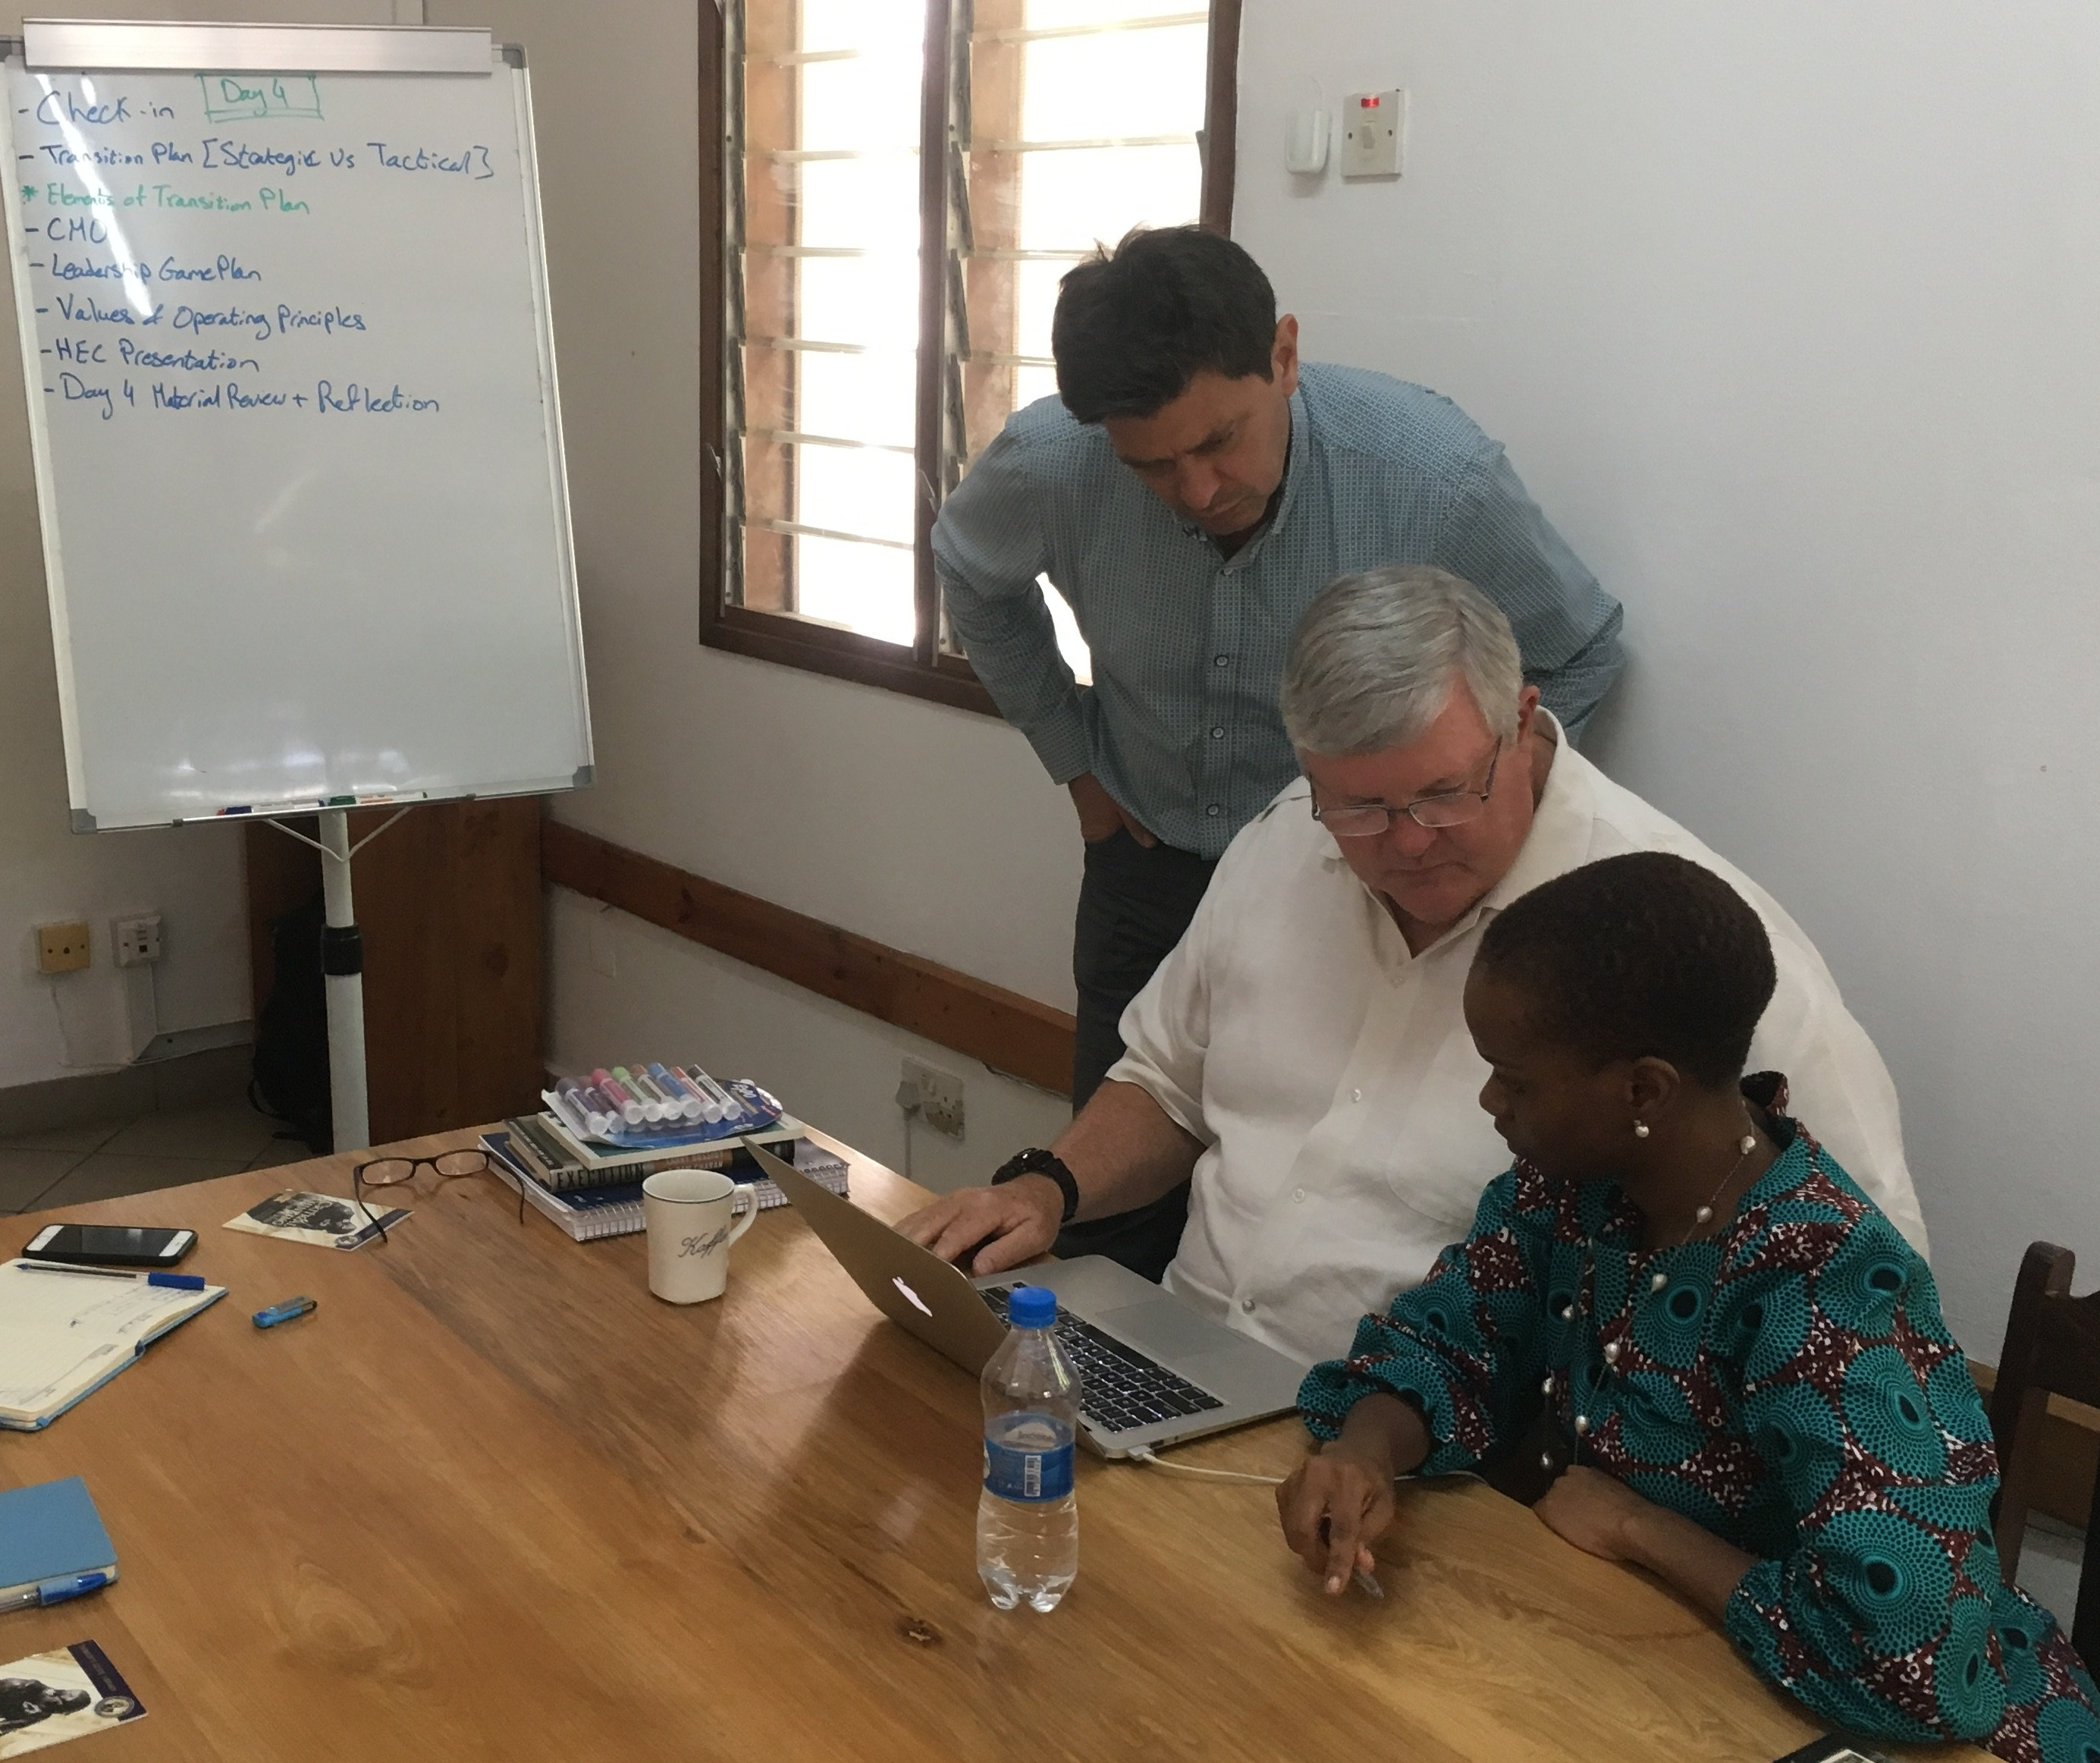 CCBRT healthcare Tanzania lean leadership training executive transition